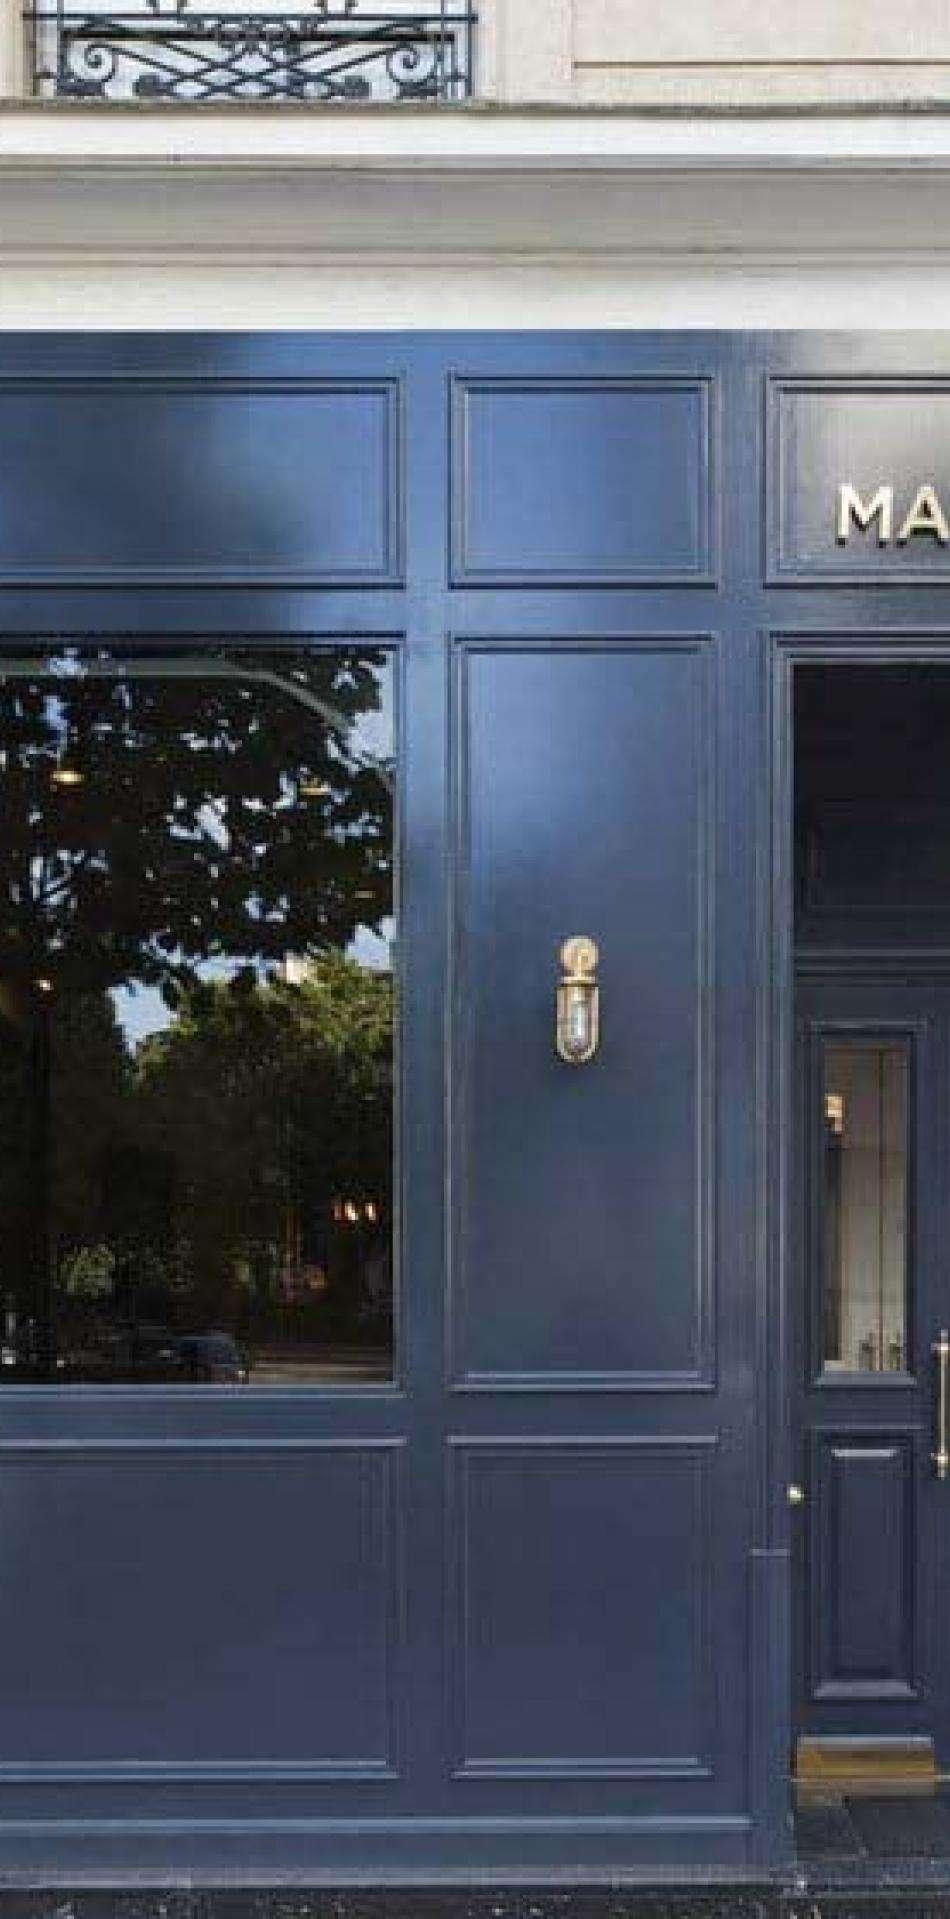 Hôtel Maison Malesherbes - Hotel